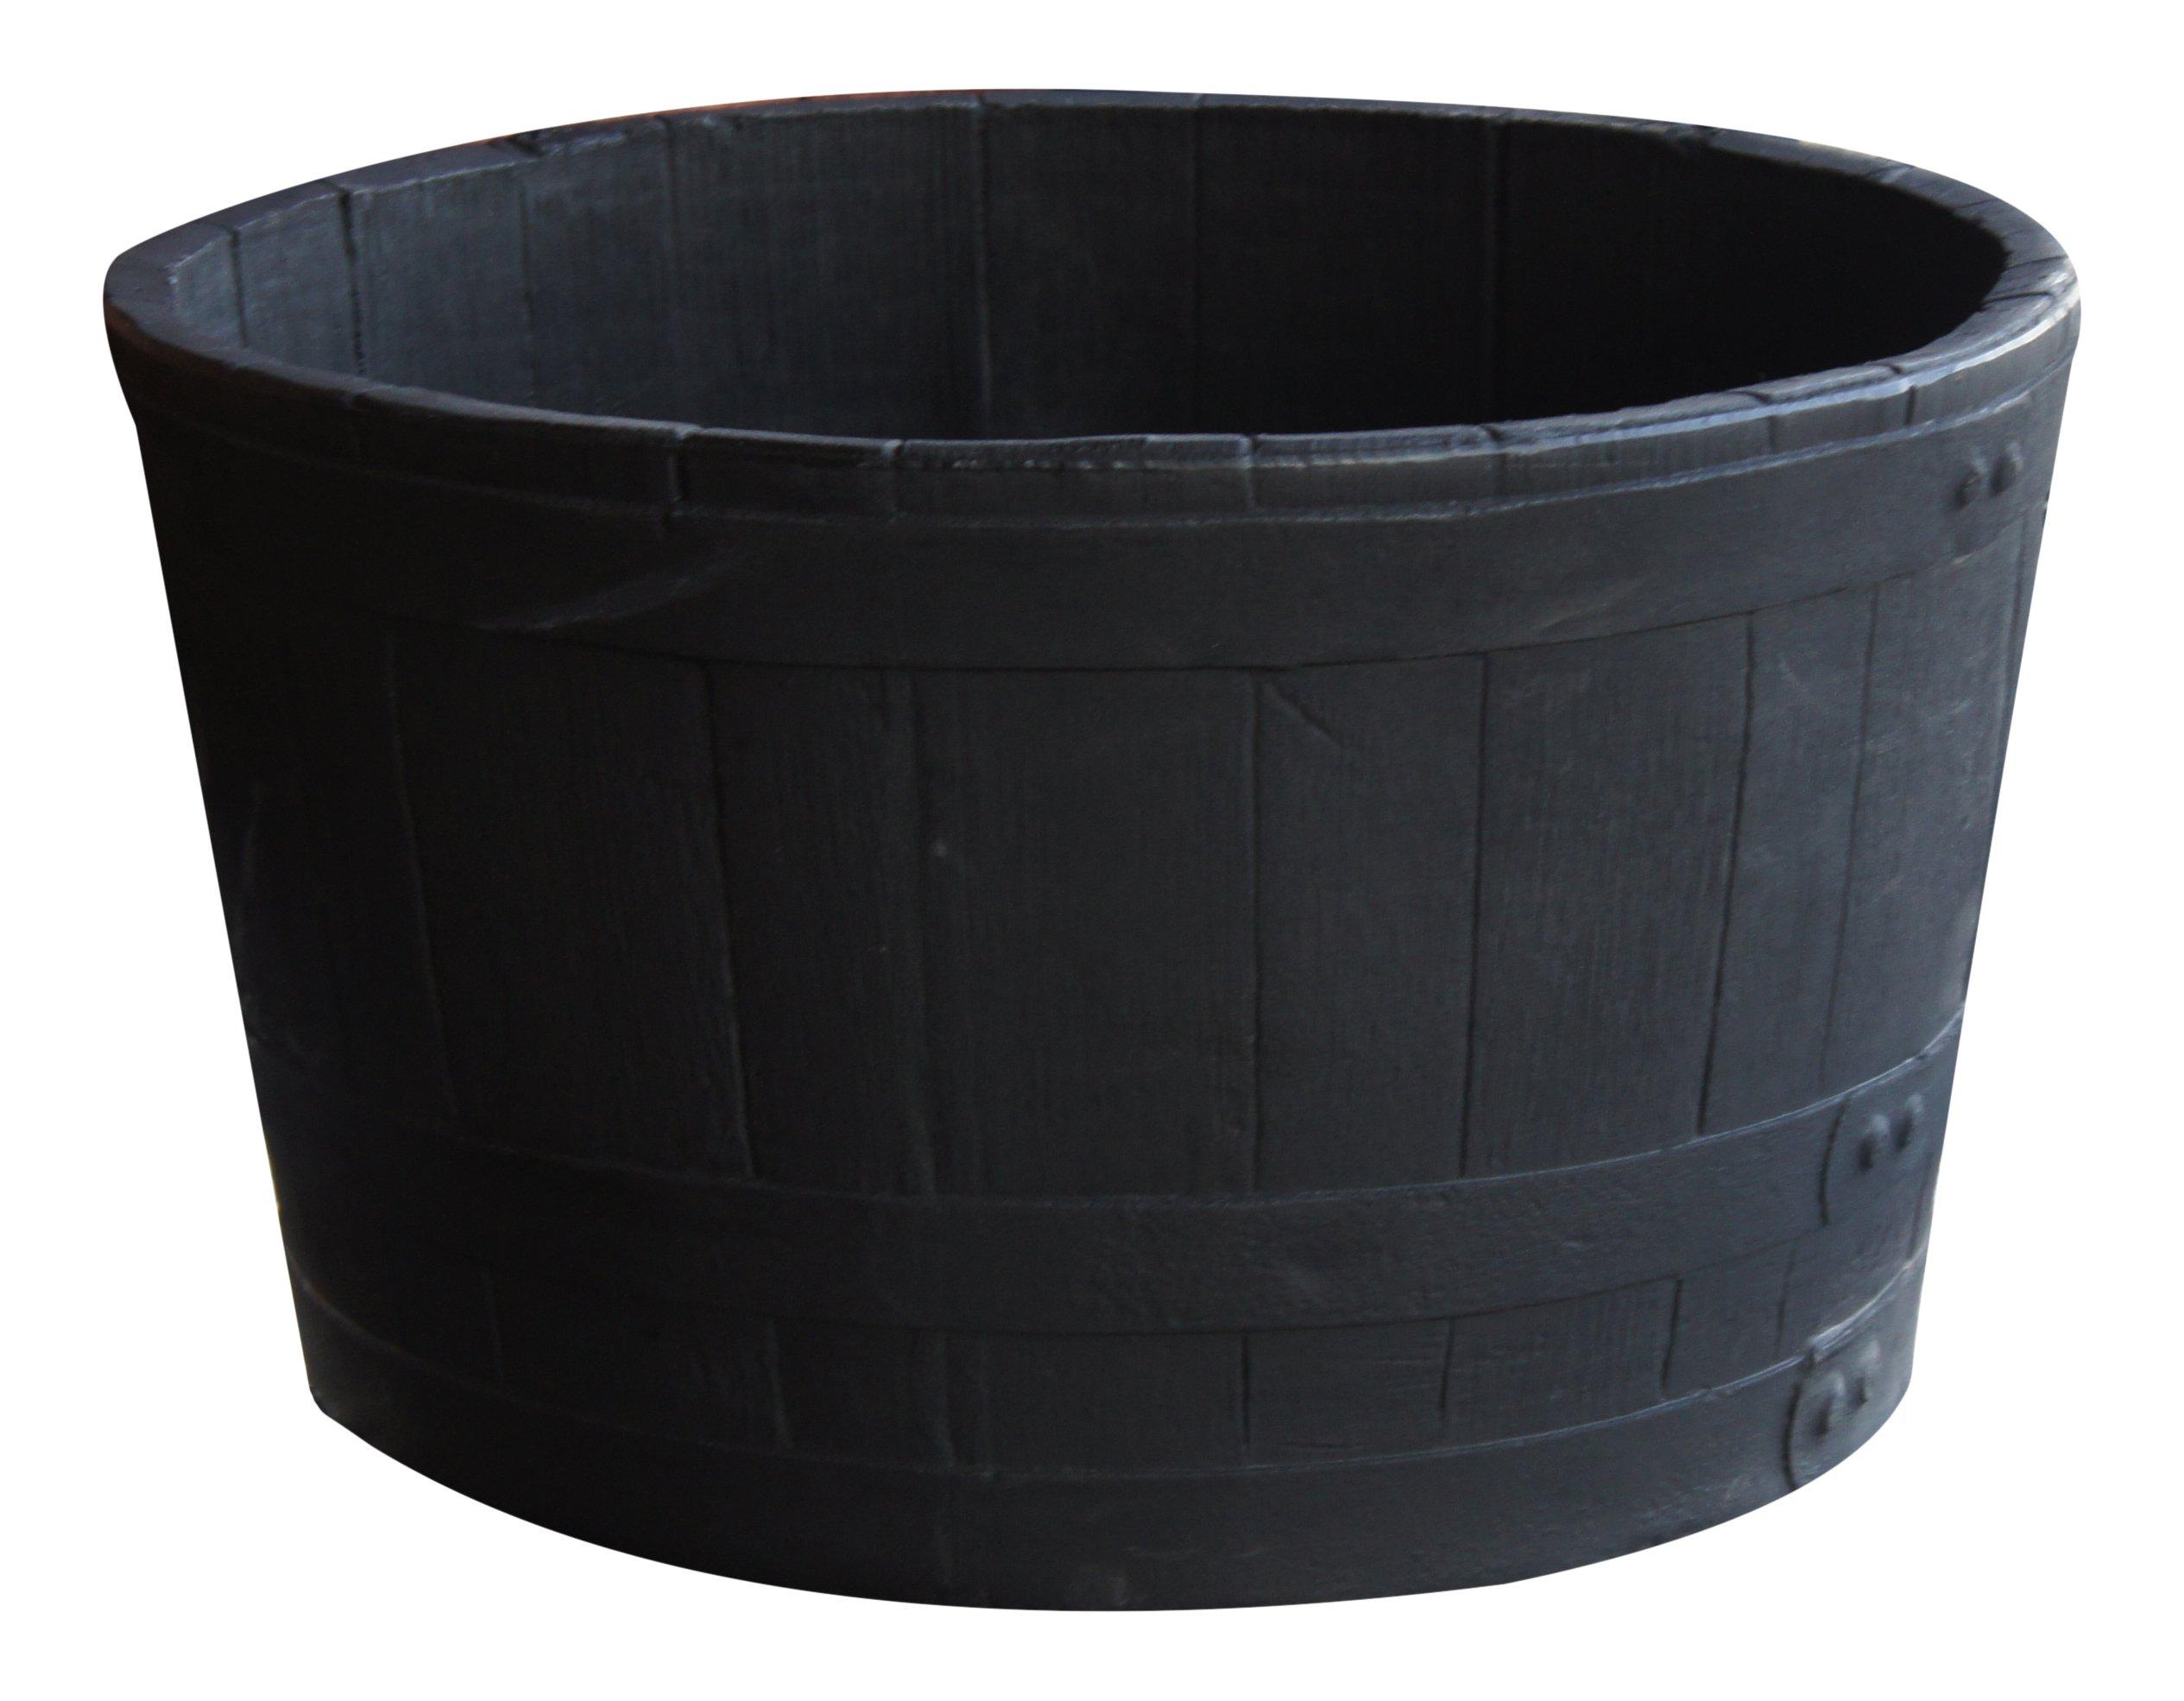 RTS Home Accents 5600-00100F-80-81 Polyethylene Barrel Planter, Black by RTS Companies Inc